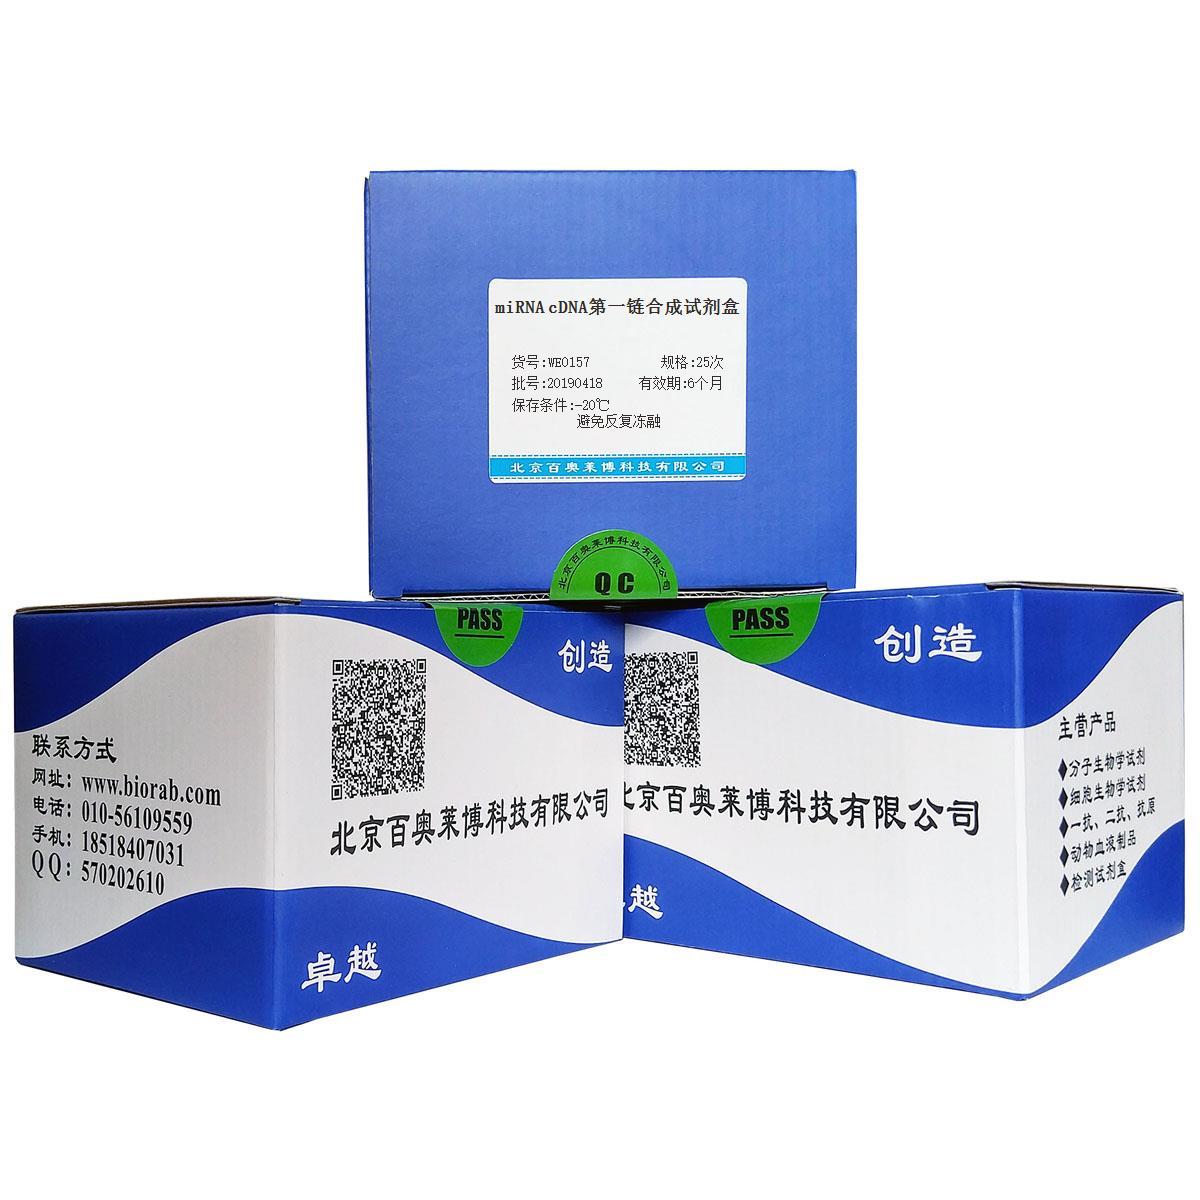 miRNA cDNA第一链合成试剂盒北京品牌